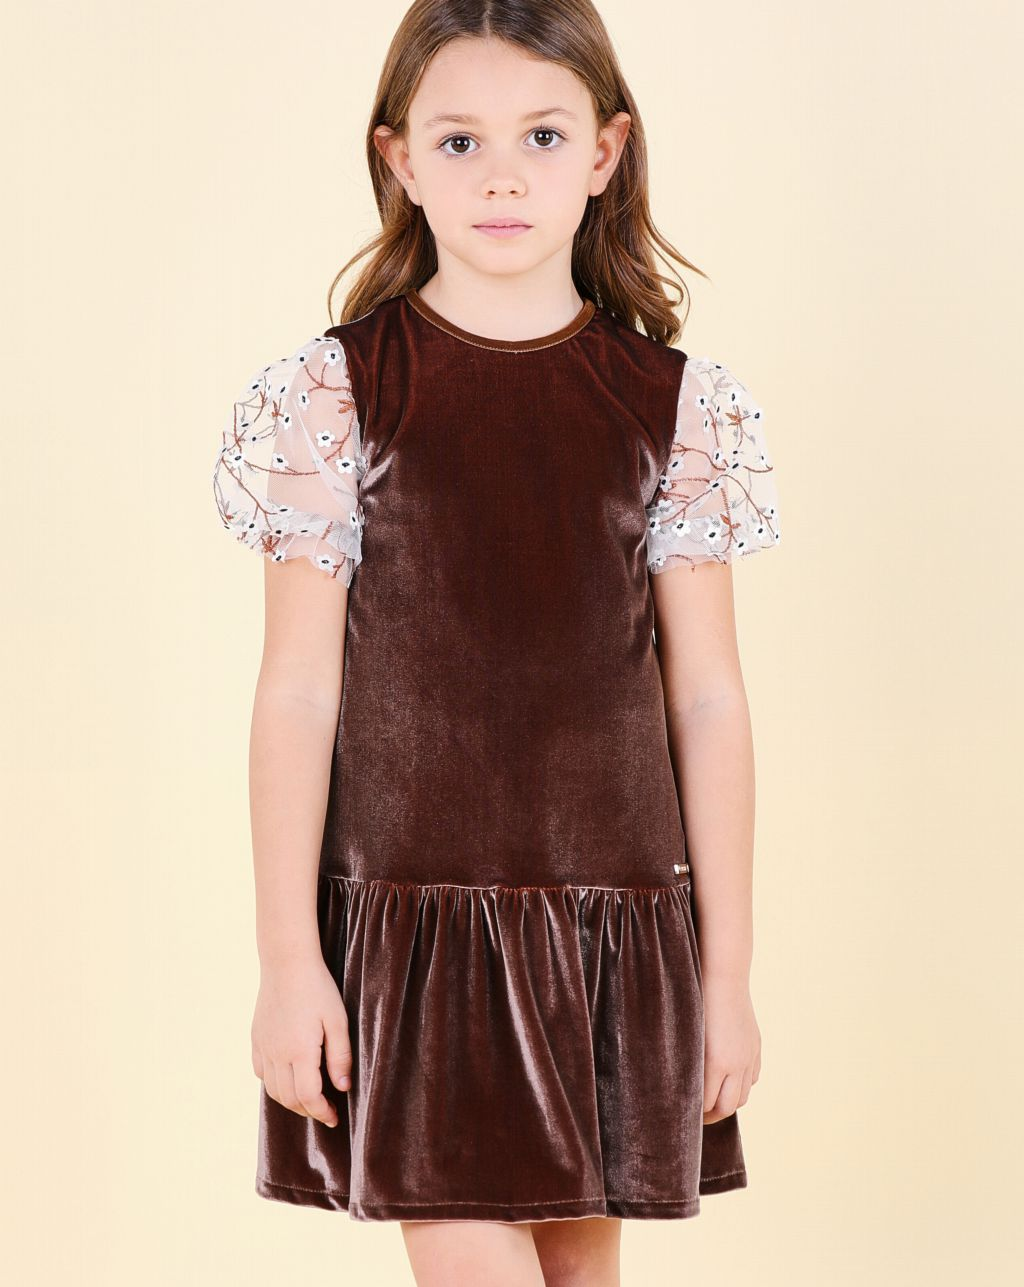 Pan con Chocolate: Vestido Jackie